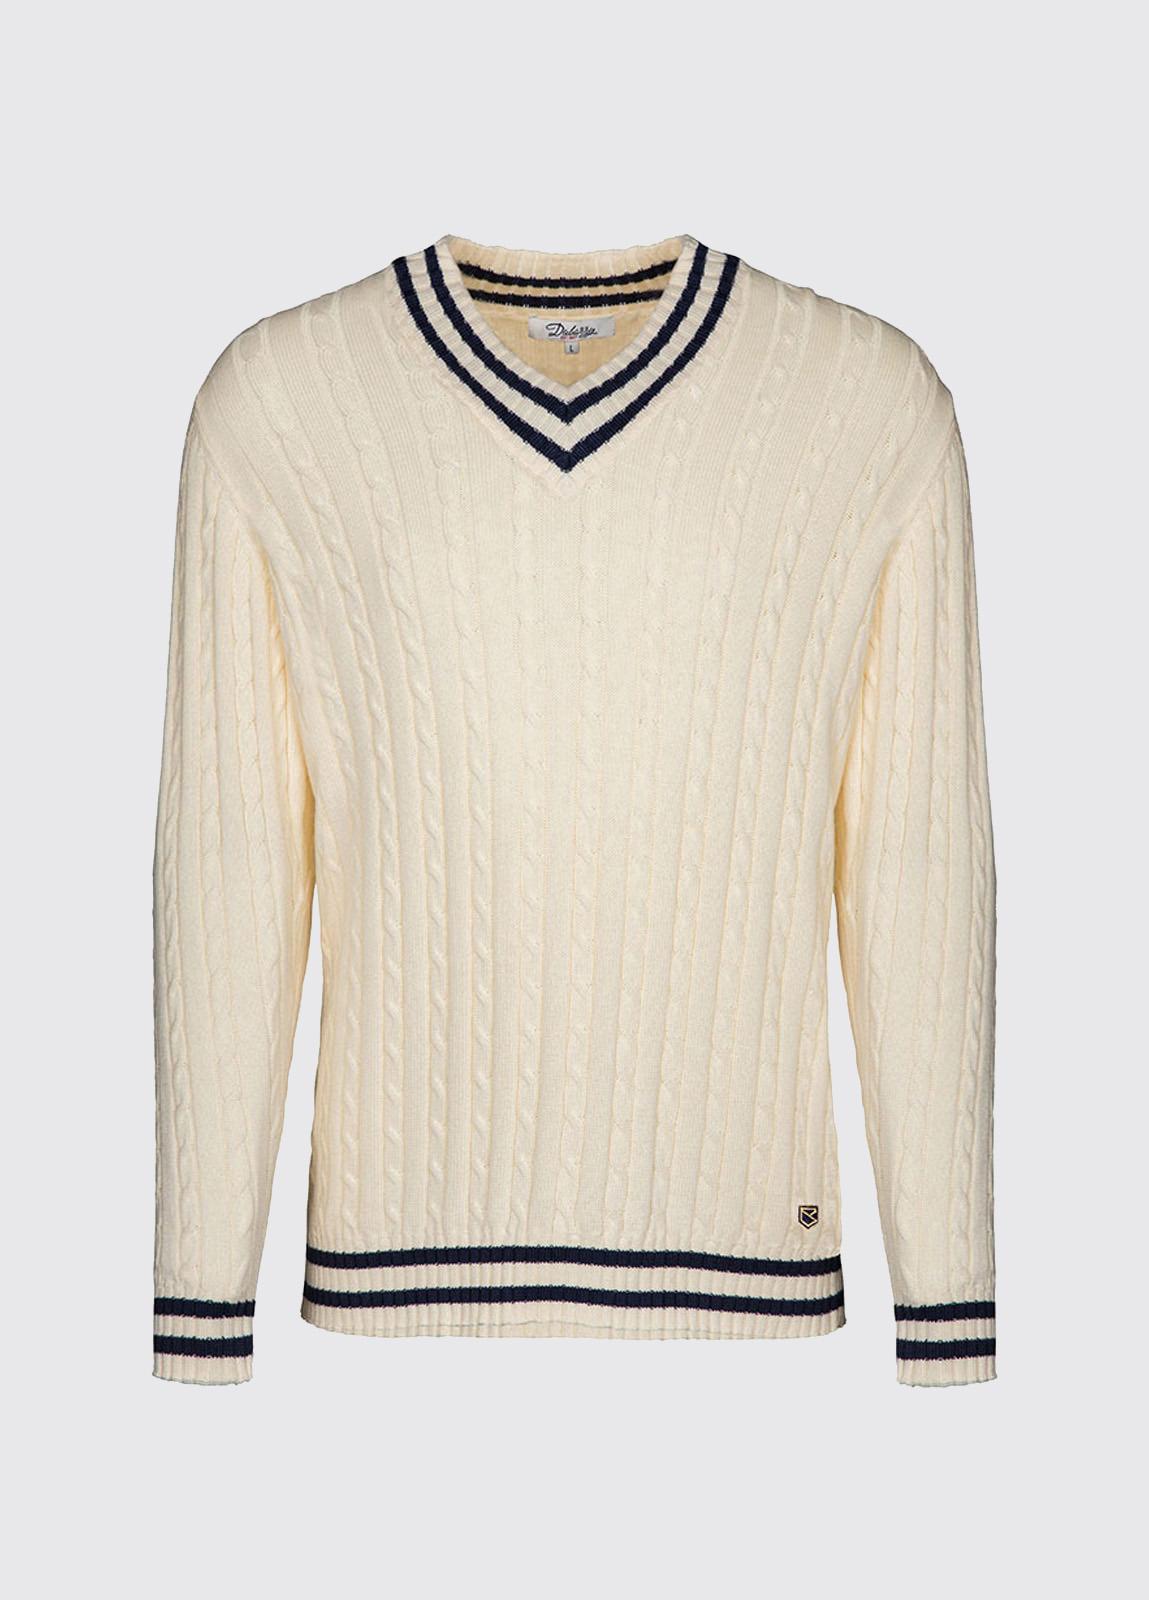 Rosbeg Sweater - Sail White